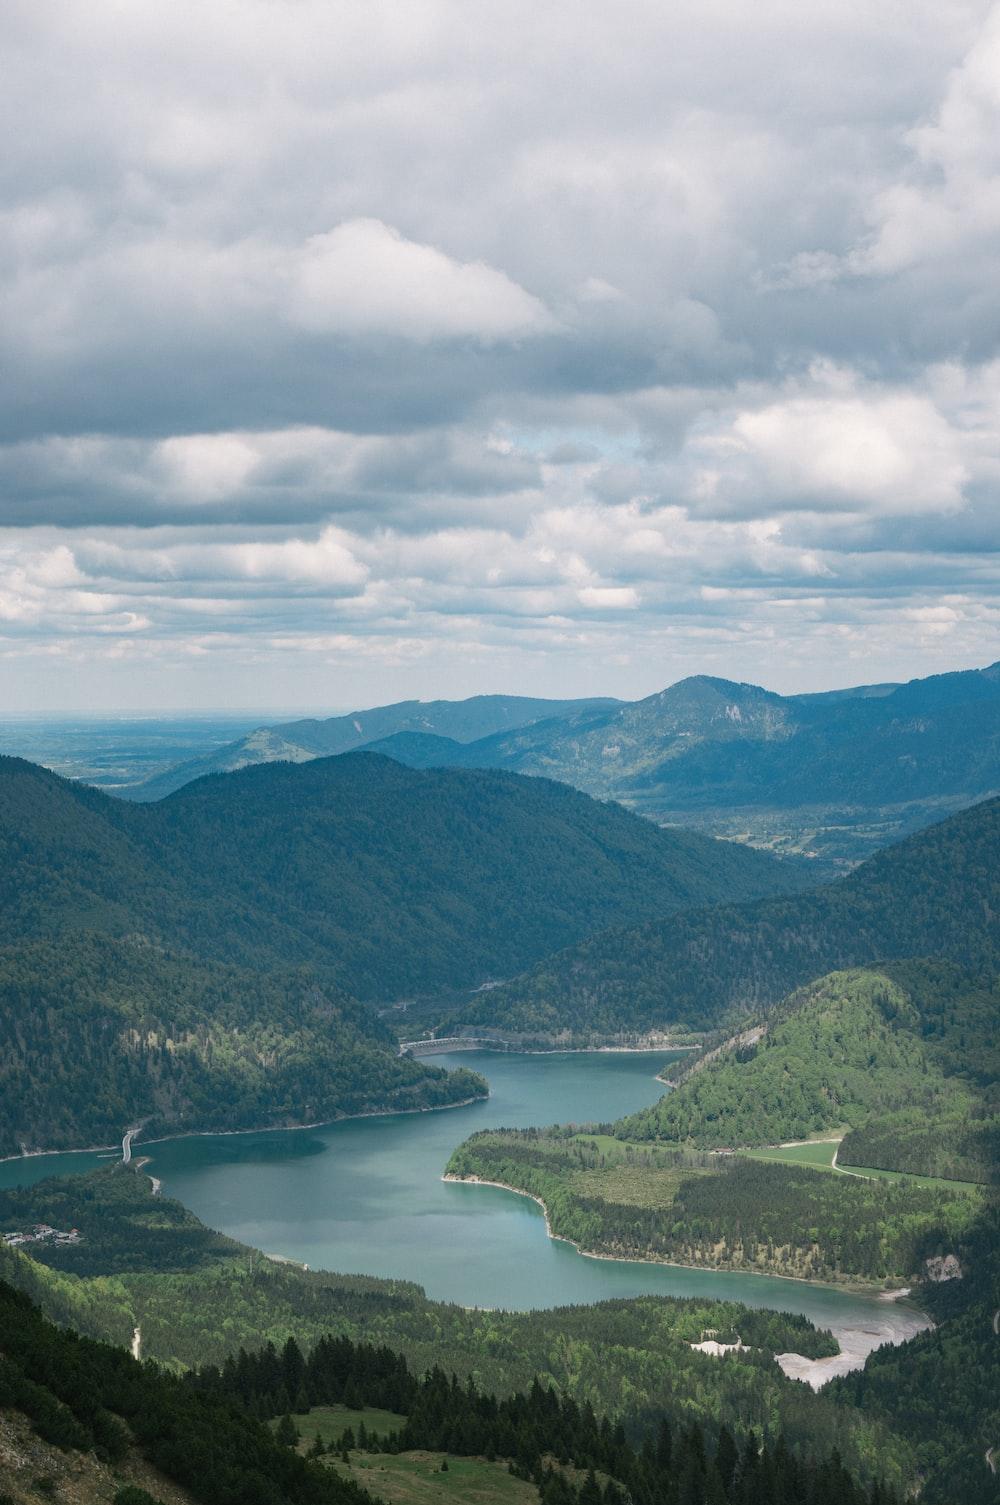 green mountains near lake under white clouds during daytime